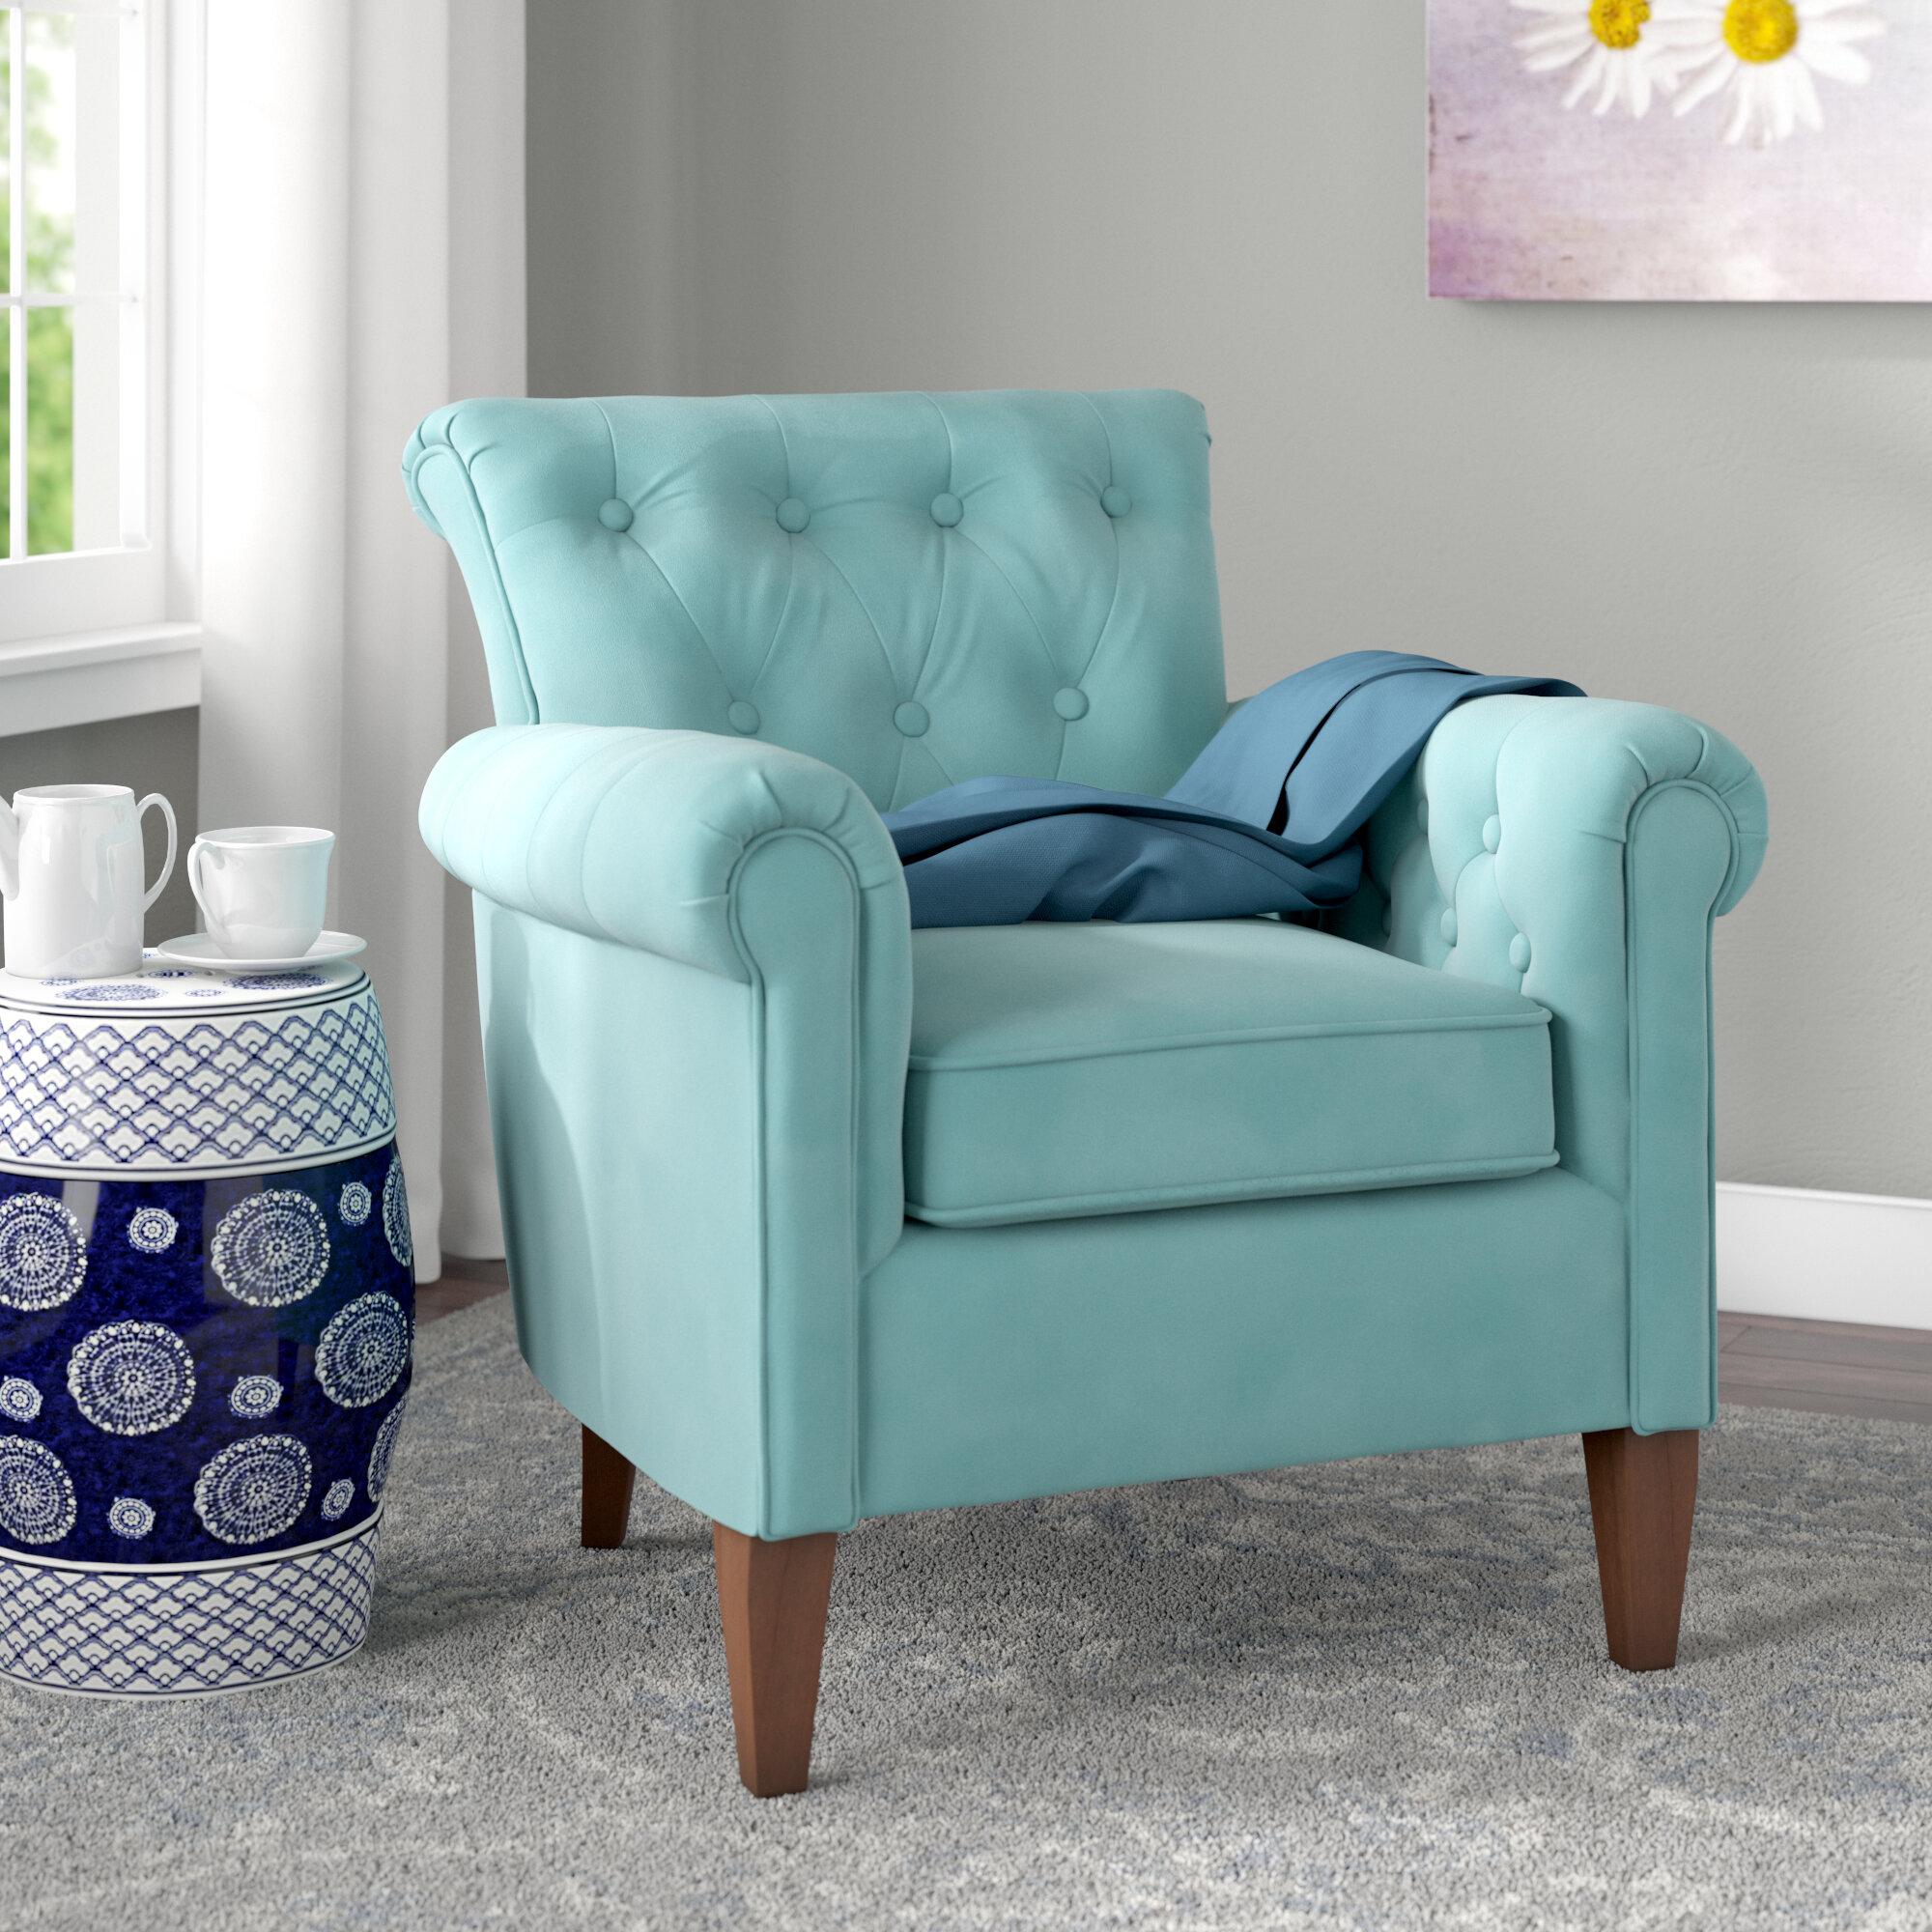 Darby Home Co Bennet Tufted Armchair U0026 Reviews | Wayfair